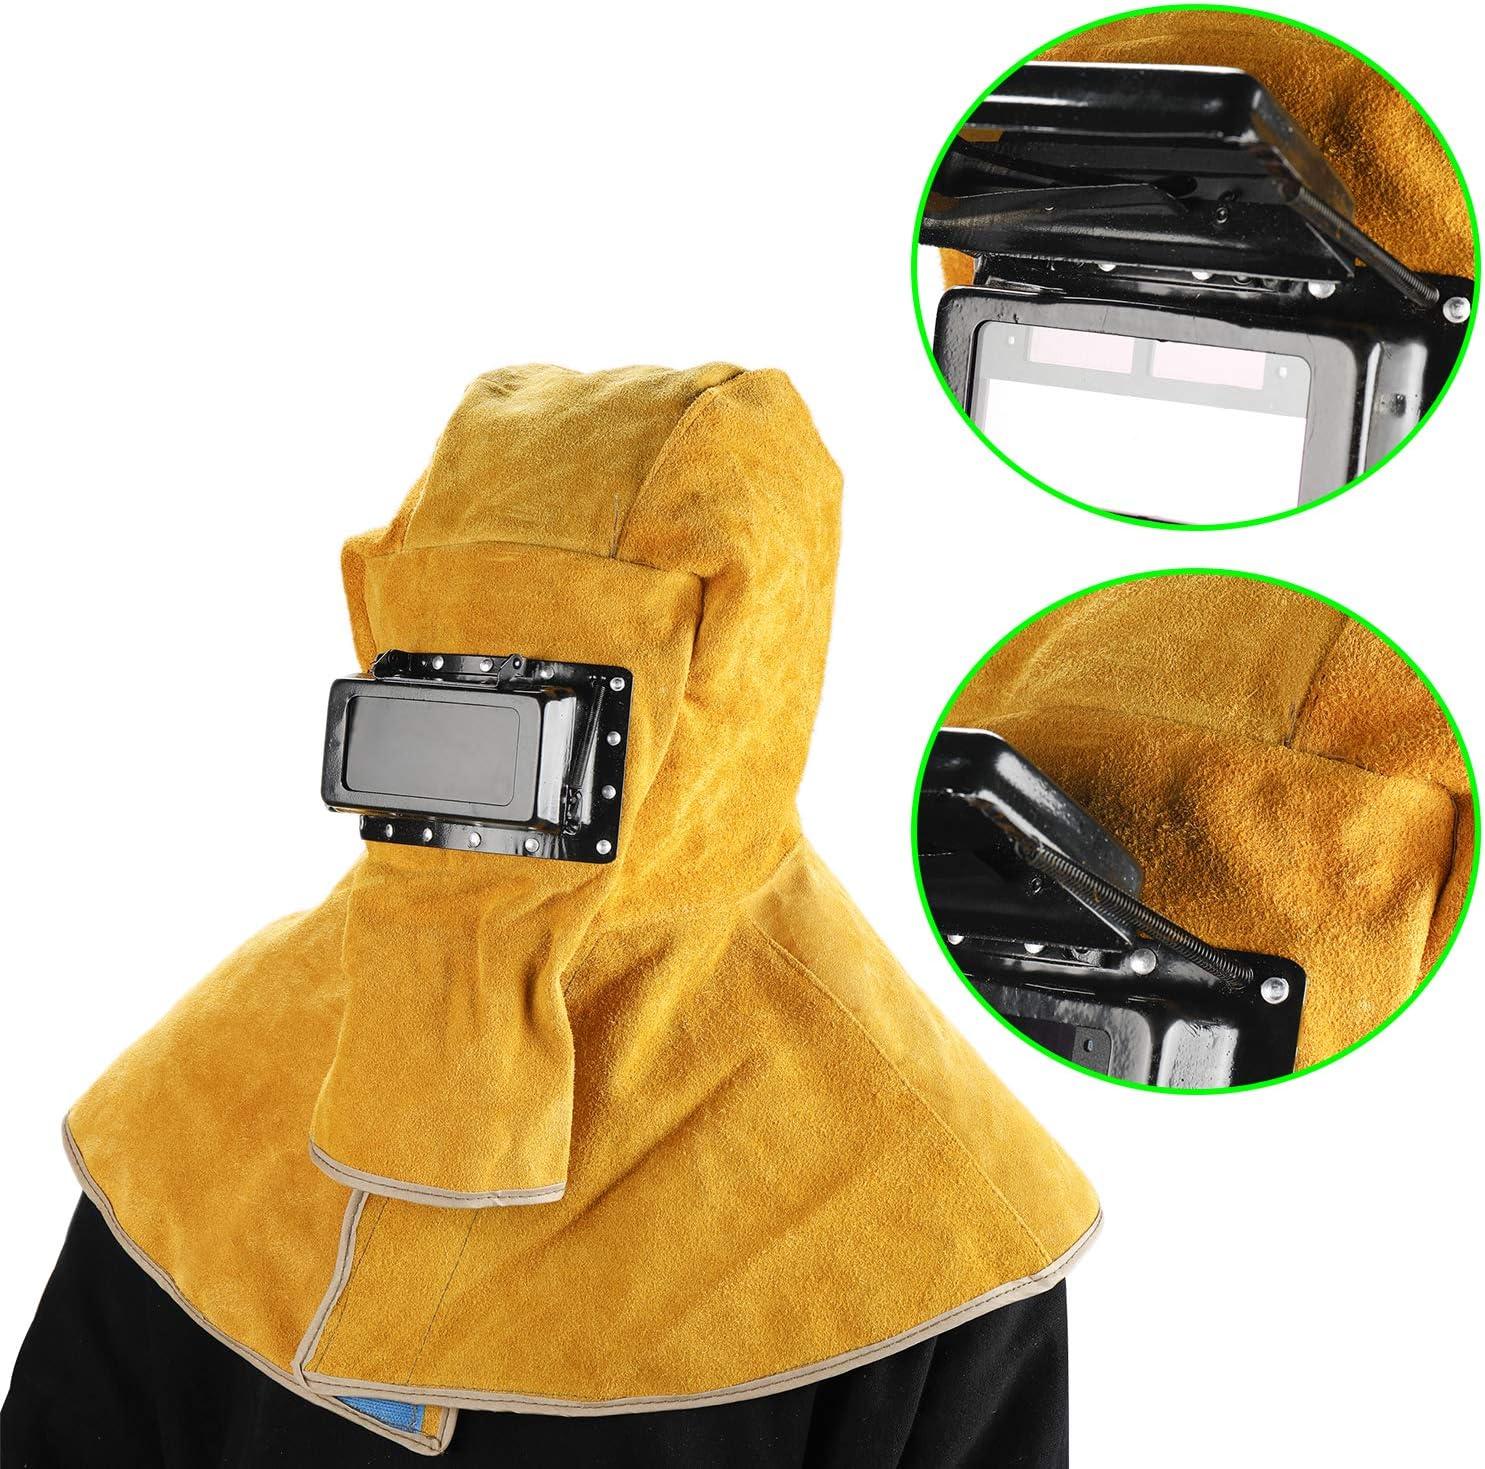 YaeMarine Yellow Solar Welding Helmet Hood Mask Helmet Cowhide Split Leather Auto Darkening Filter Lens Protection Leather Head-Mounted Shawl Welding Protective Mask